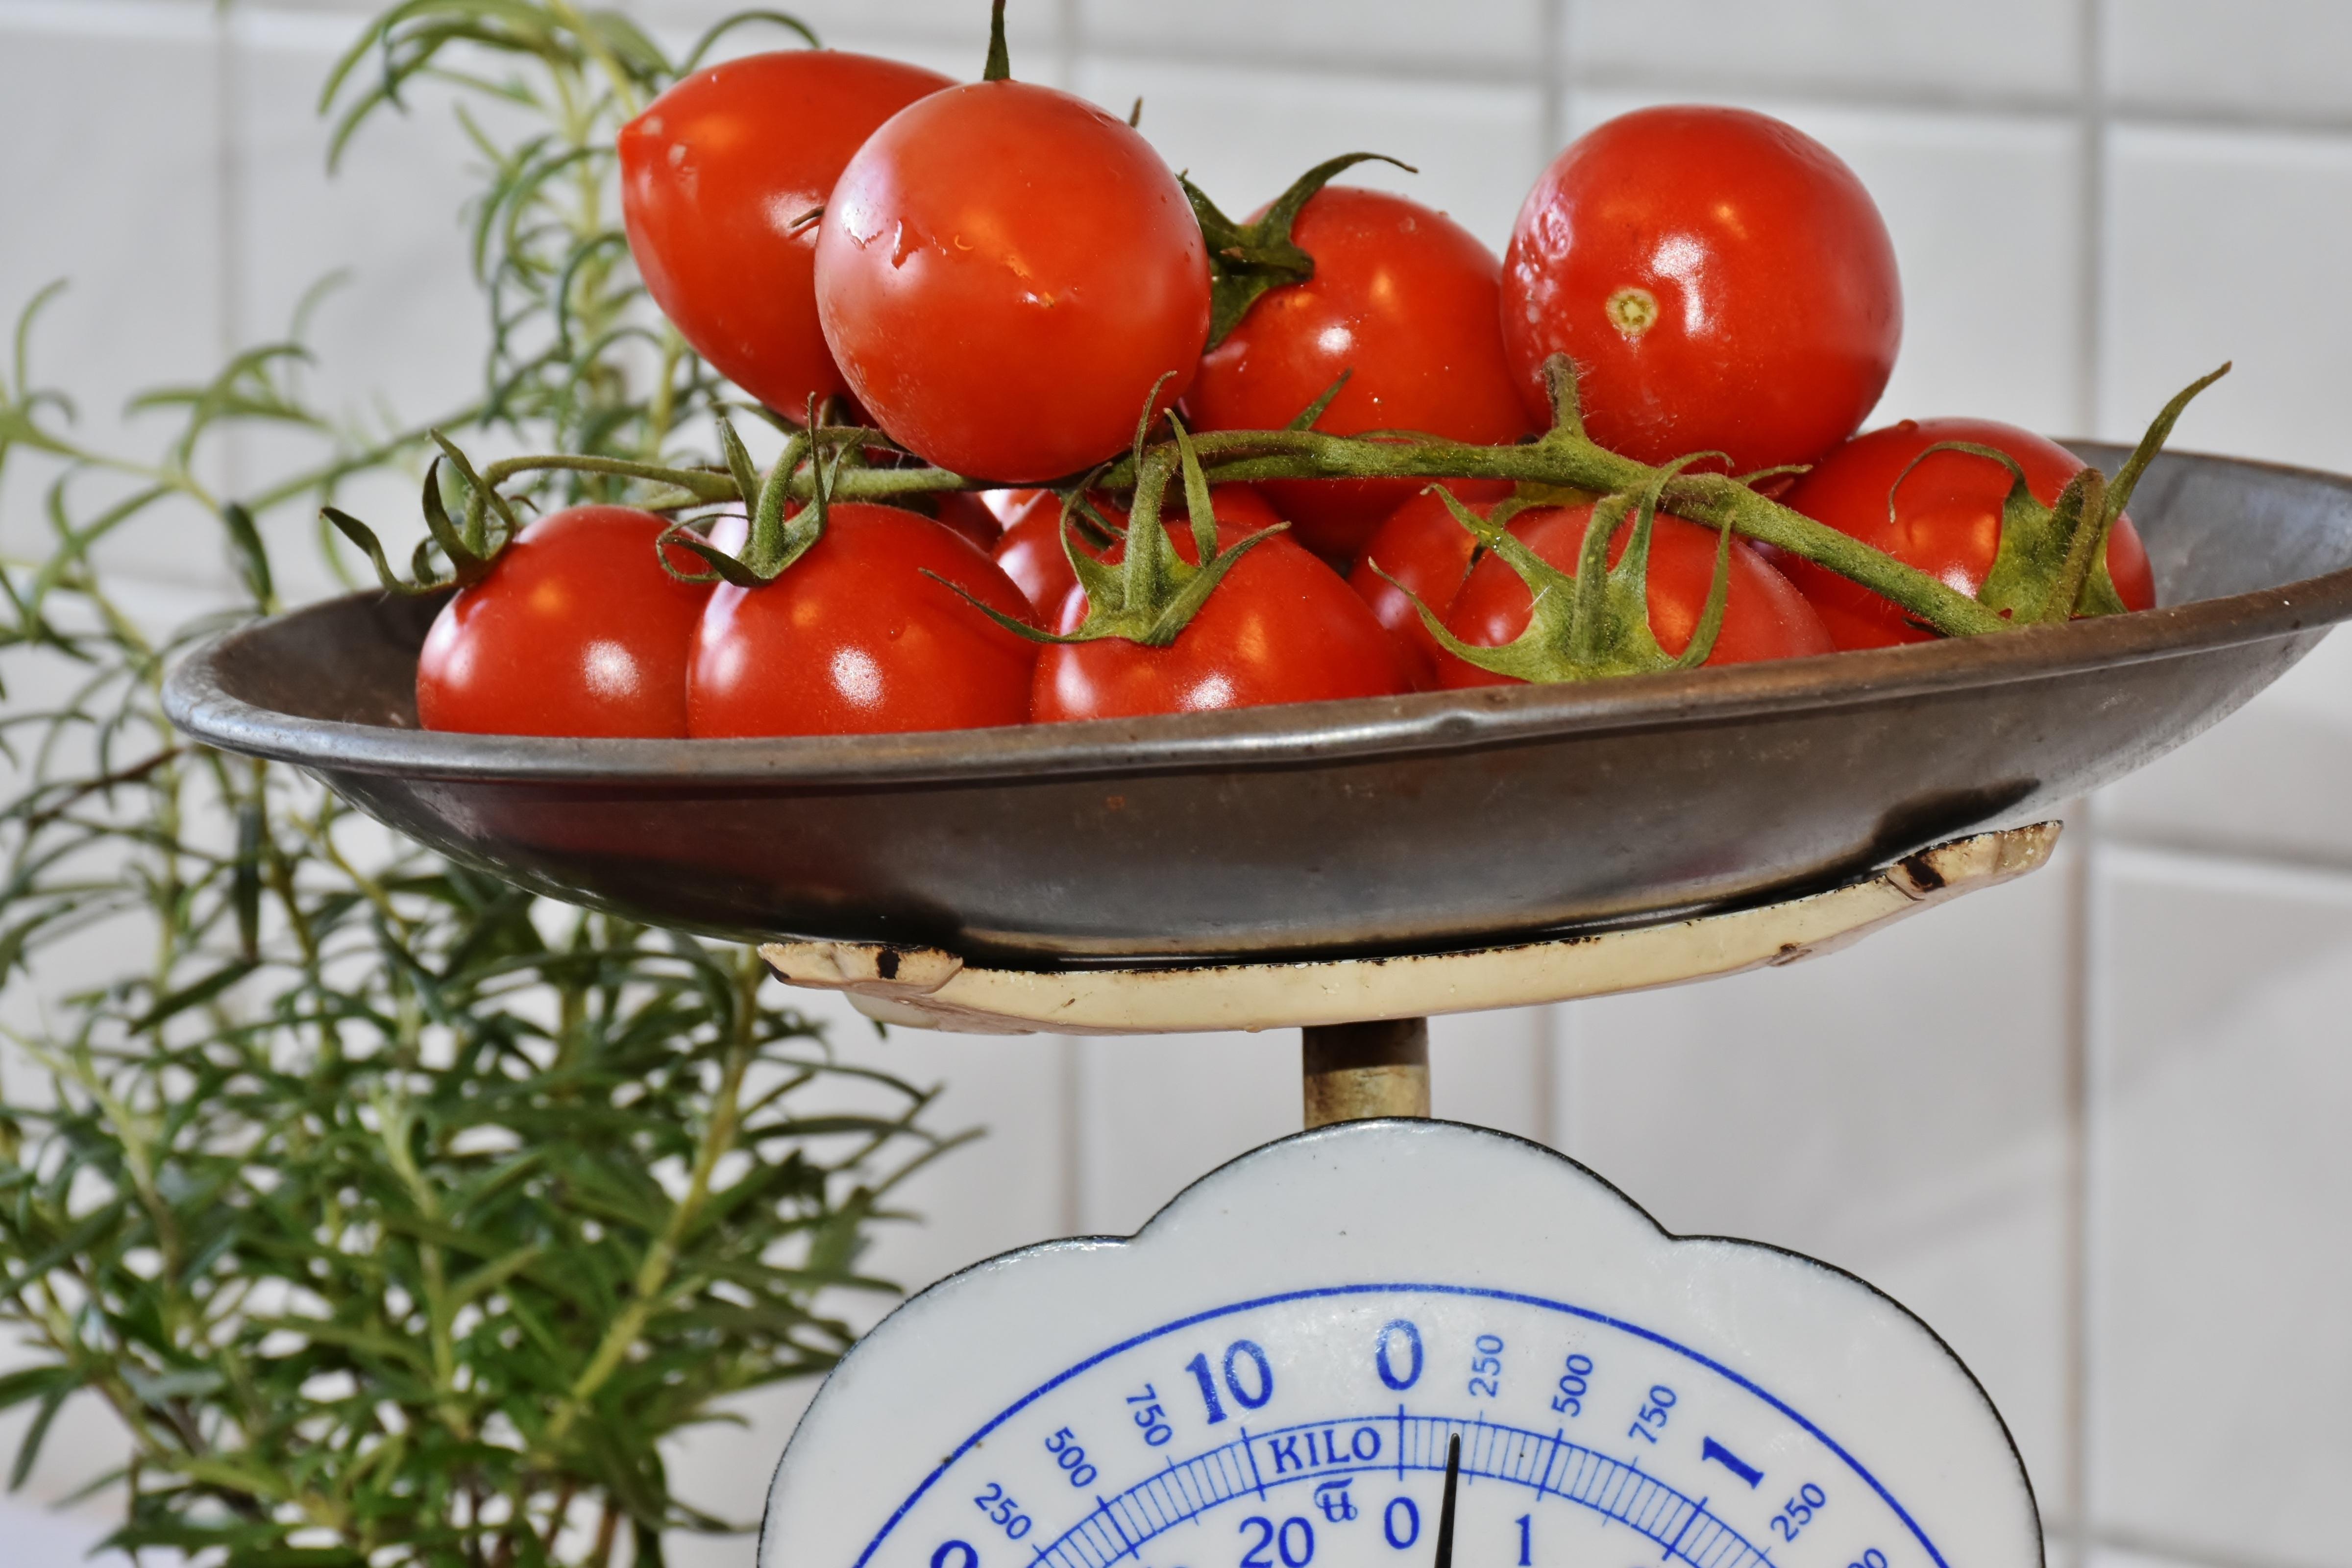 Gambar Menanam Buah Bunga Makan Makanan Salad Merah Menghasilkan Sayur Mayur Dapur Menimbang Sehat Kalori Sayuran Lezat Vegetarian